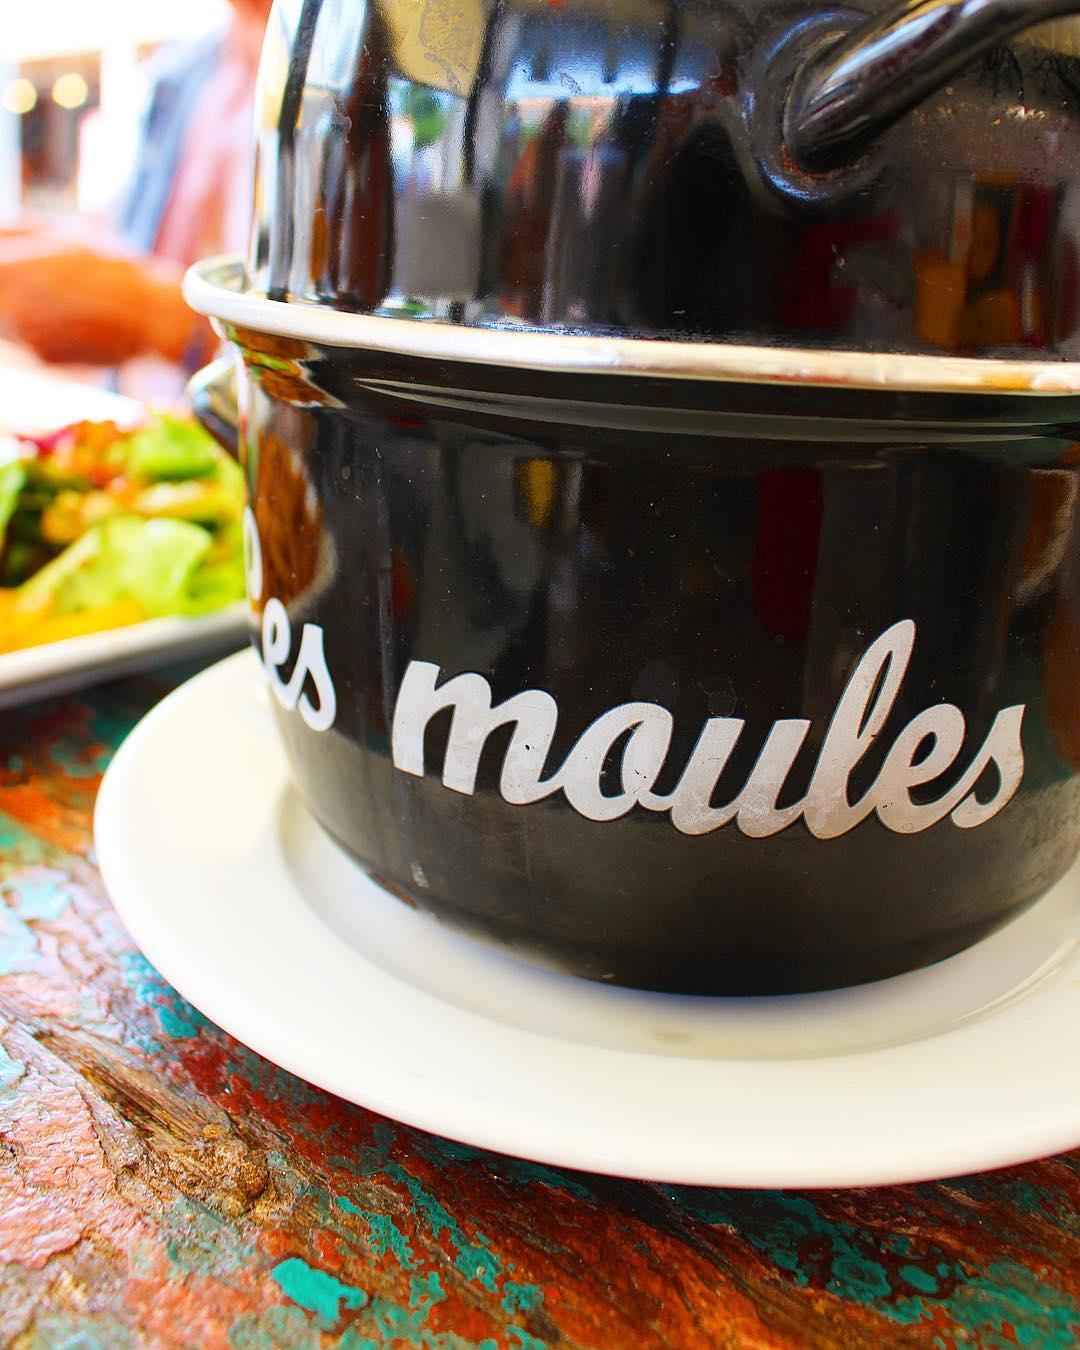 Journée touristes entre moules ❤️ . ➕Moules et compagnie • restaurant . ?MARSEILLAN Plage (34)?? . ________________ #restaurant #marseillan #marseillanplage #food #blogfood #foodlover  #pintademontpellier #montpellier #moulesetcompagnie #moulesfrites